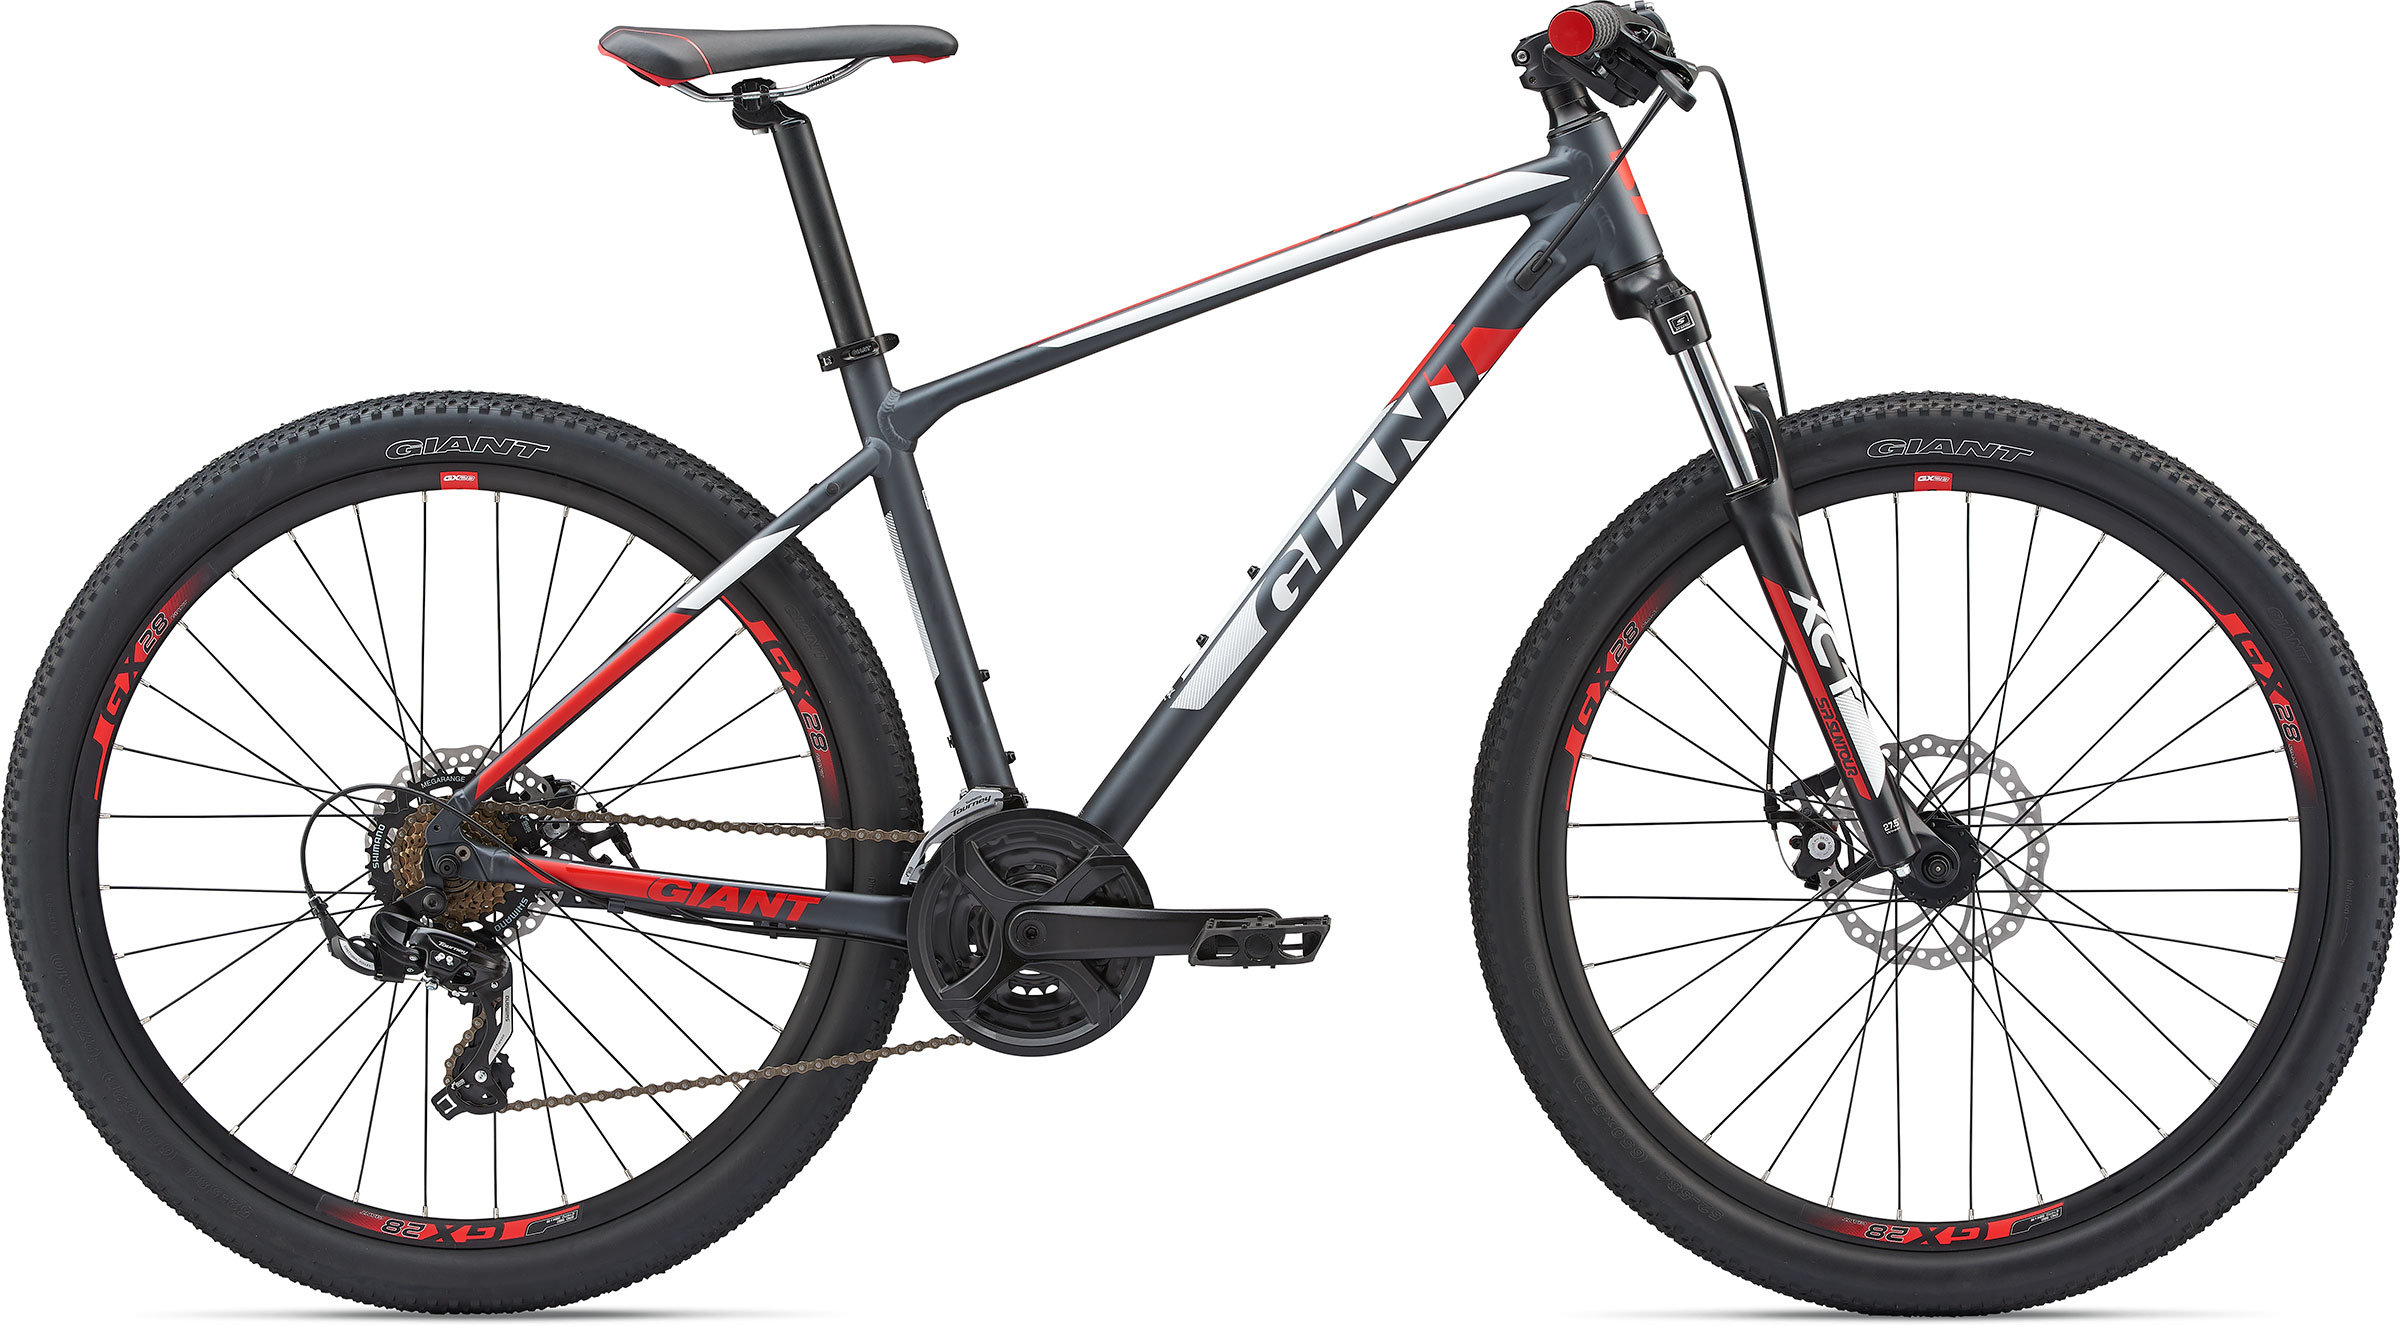 Giant Mountain Bike 27 5 Inch Wheels